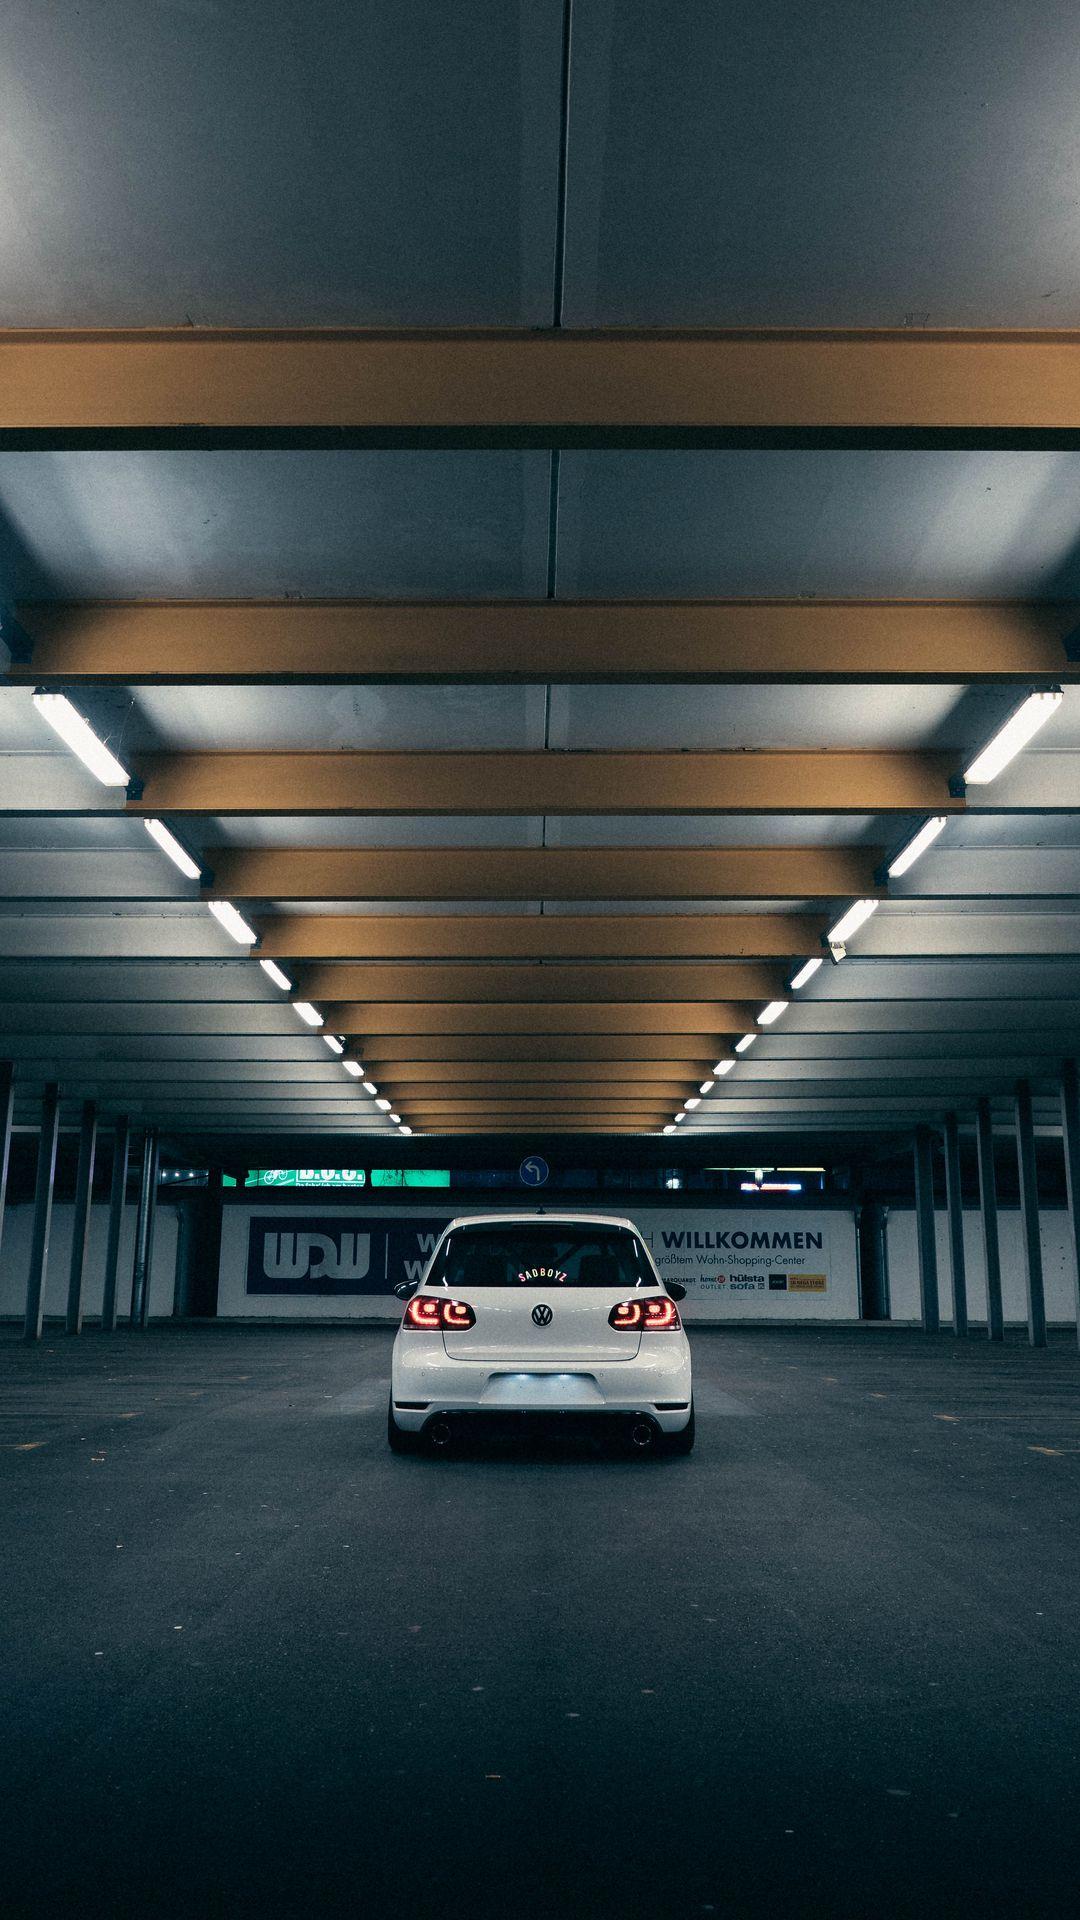 Volkswagen Golf GTI HD Wallpapers Free Download